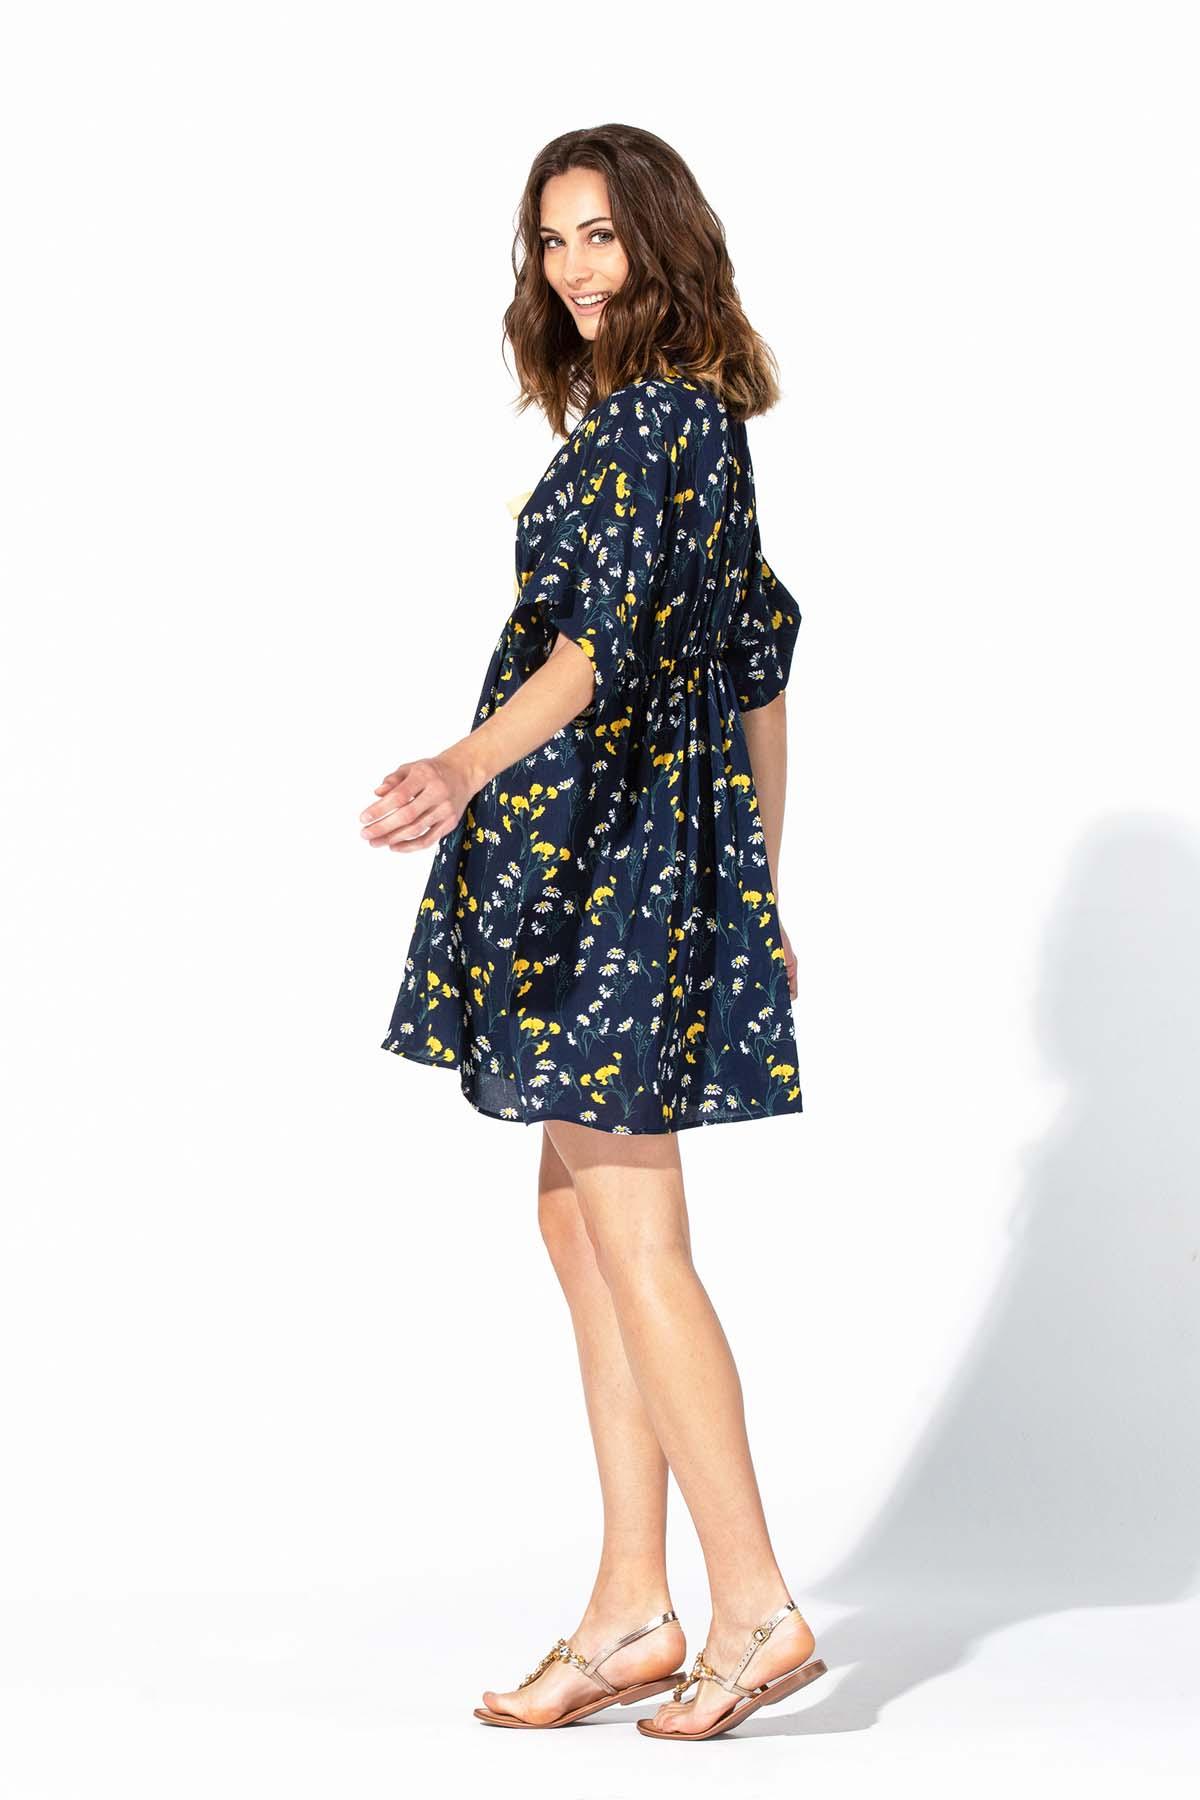 Vestido suelto azul Teria Yabar - Vestido suelto azul